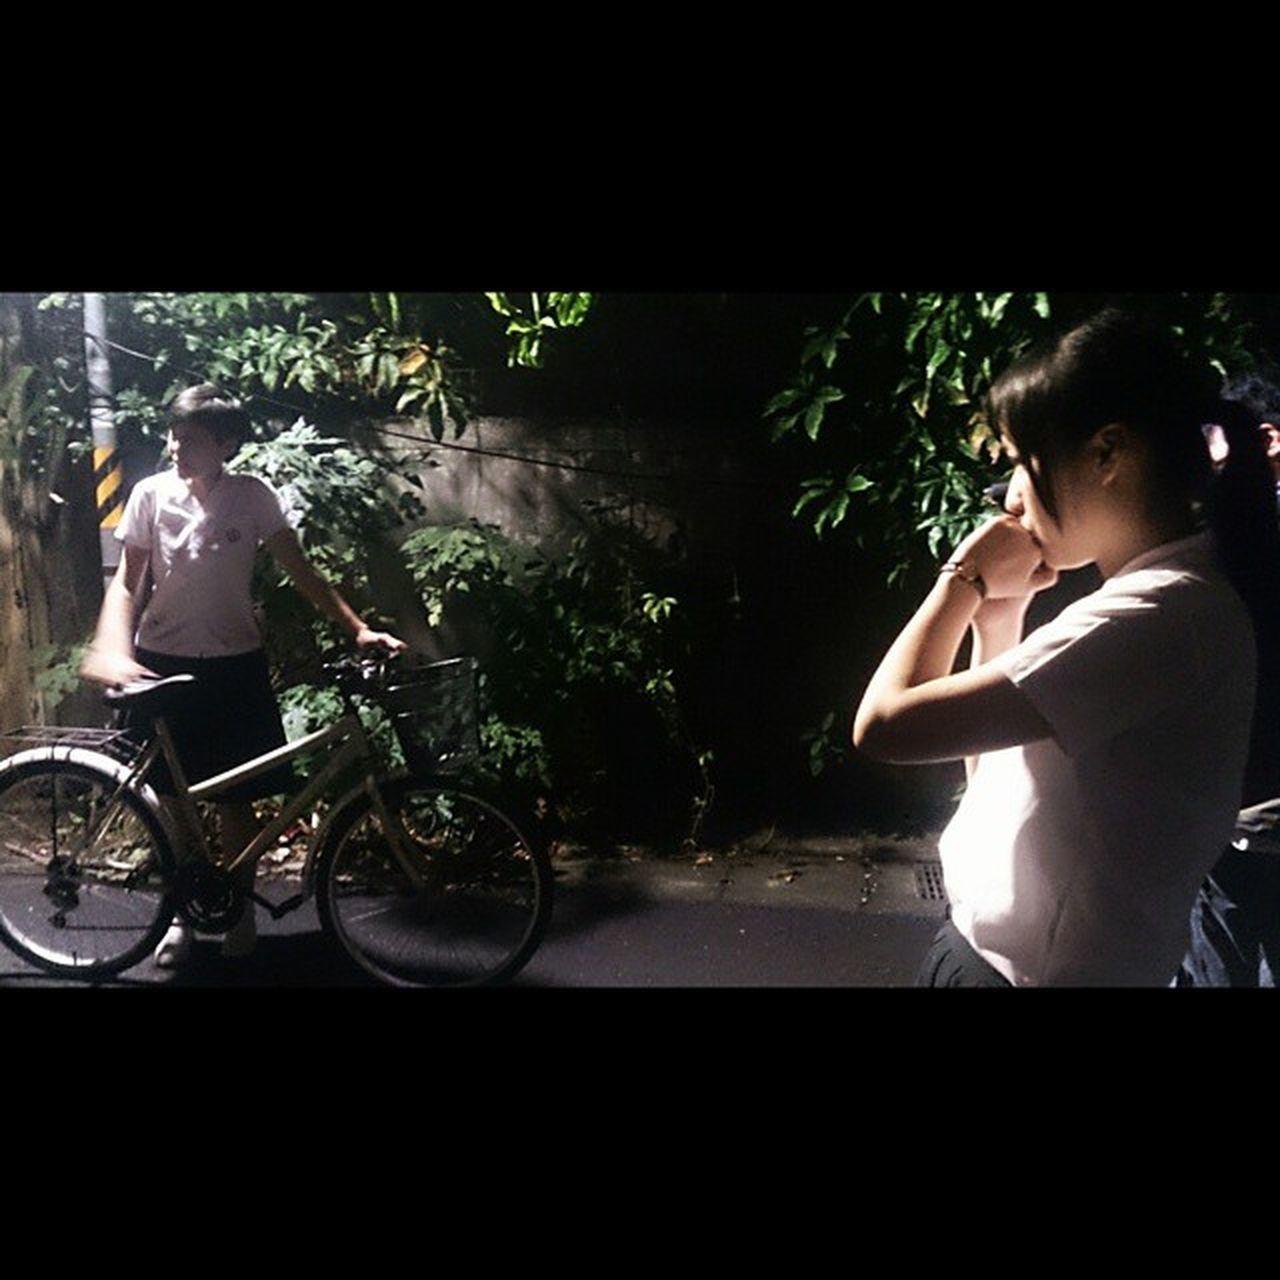 Instasize Photooftheday Vscocam Vfs2 hkig jpig twig twigers student bike streetlights plants 到了這個時候思緒頻頻冒出來 質跟量